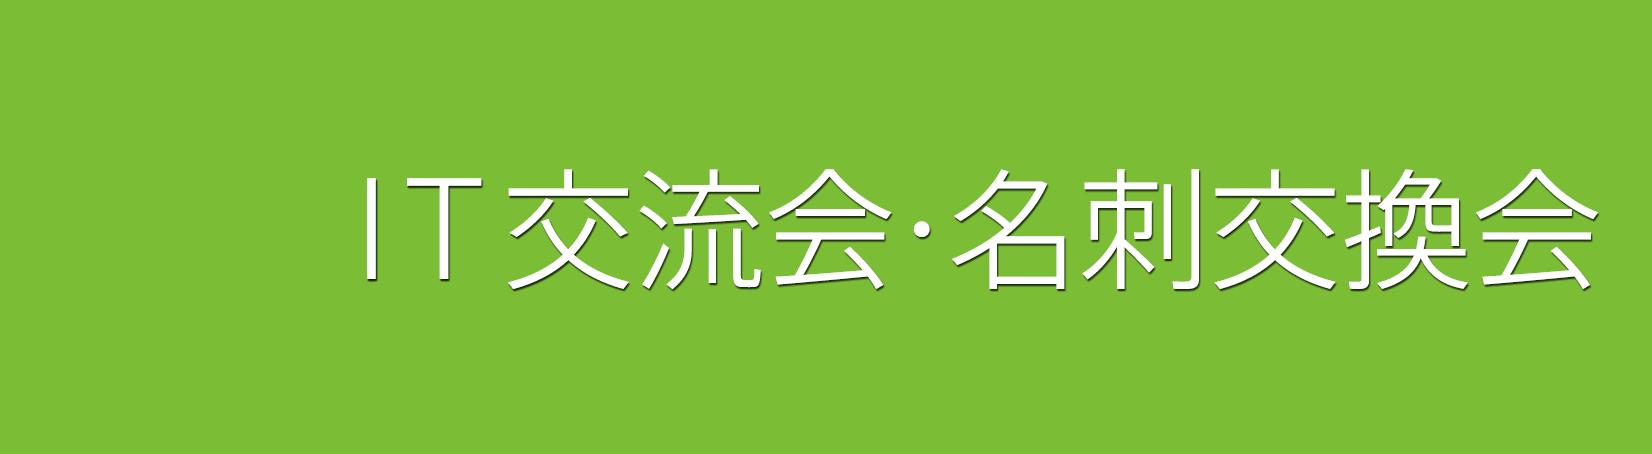 IT交流会・名刺交換会